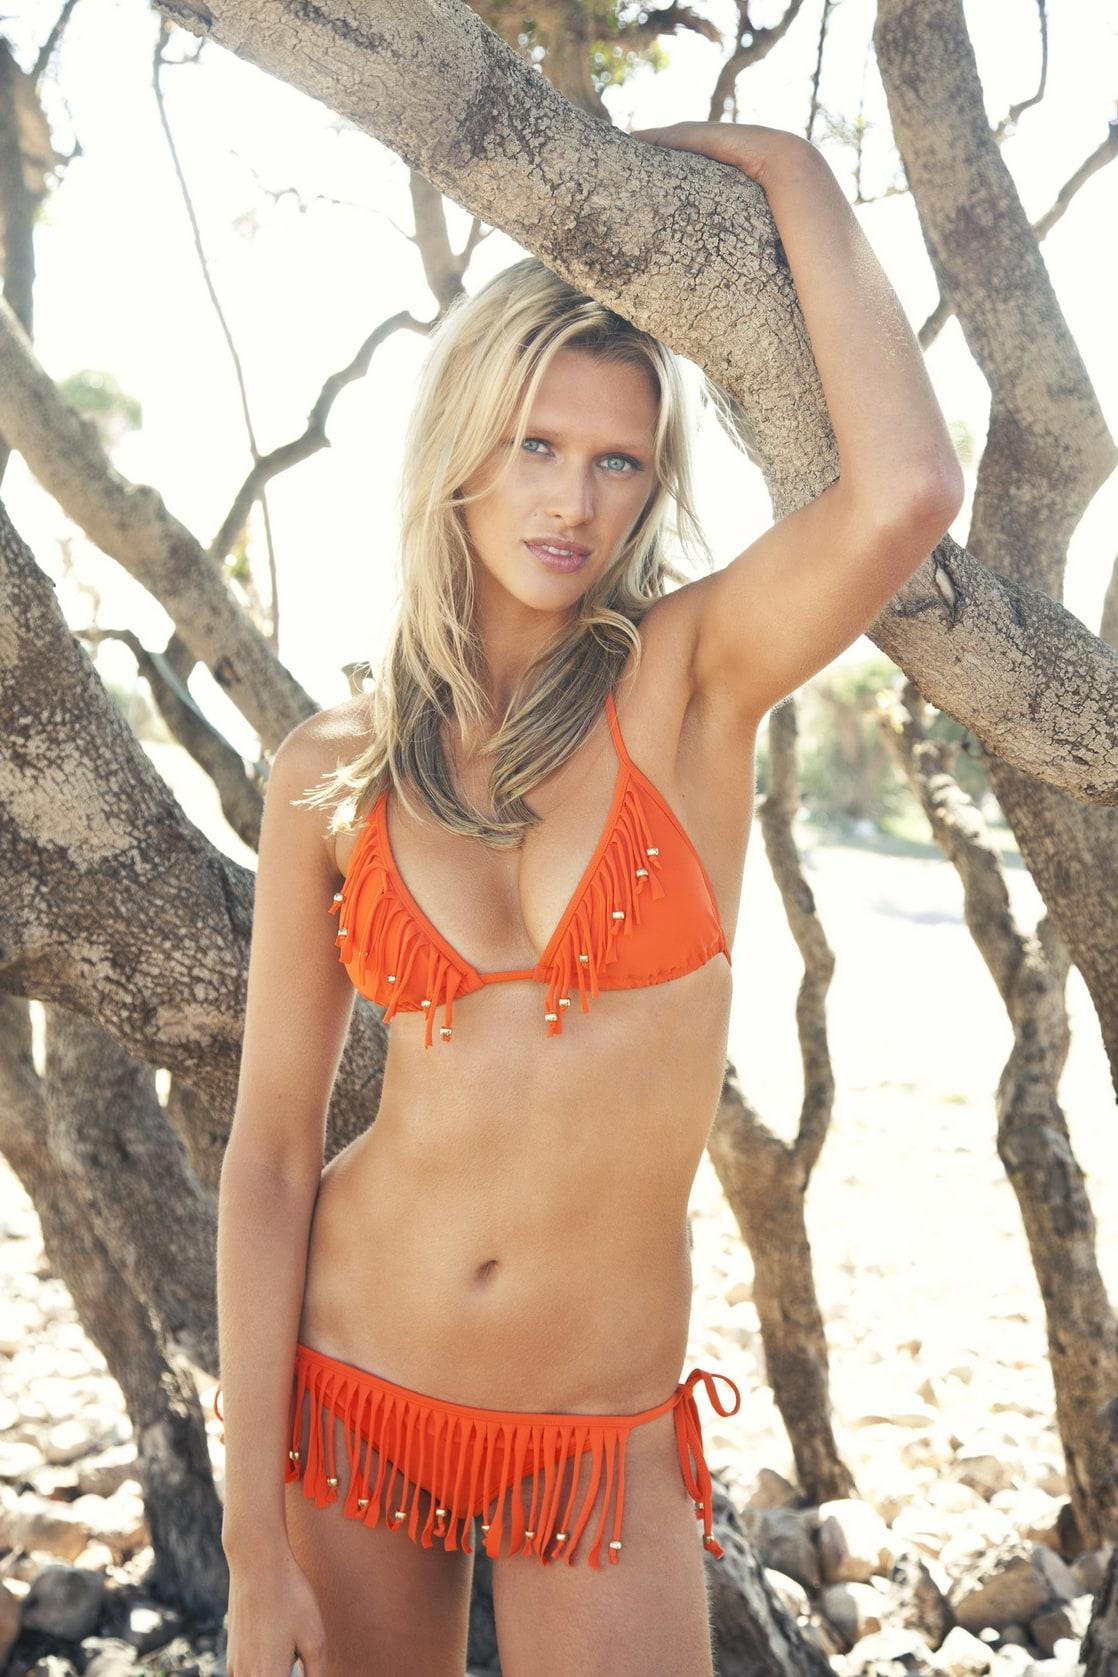 Hannah hilton babestation nude